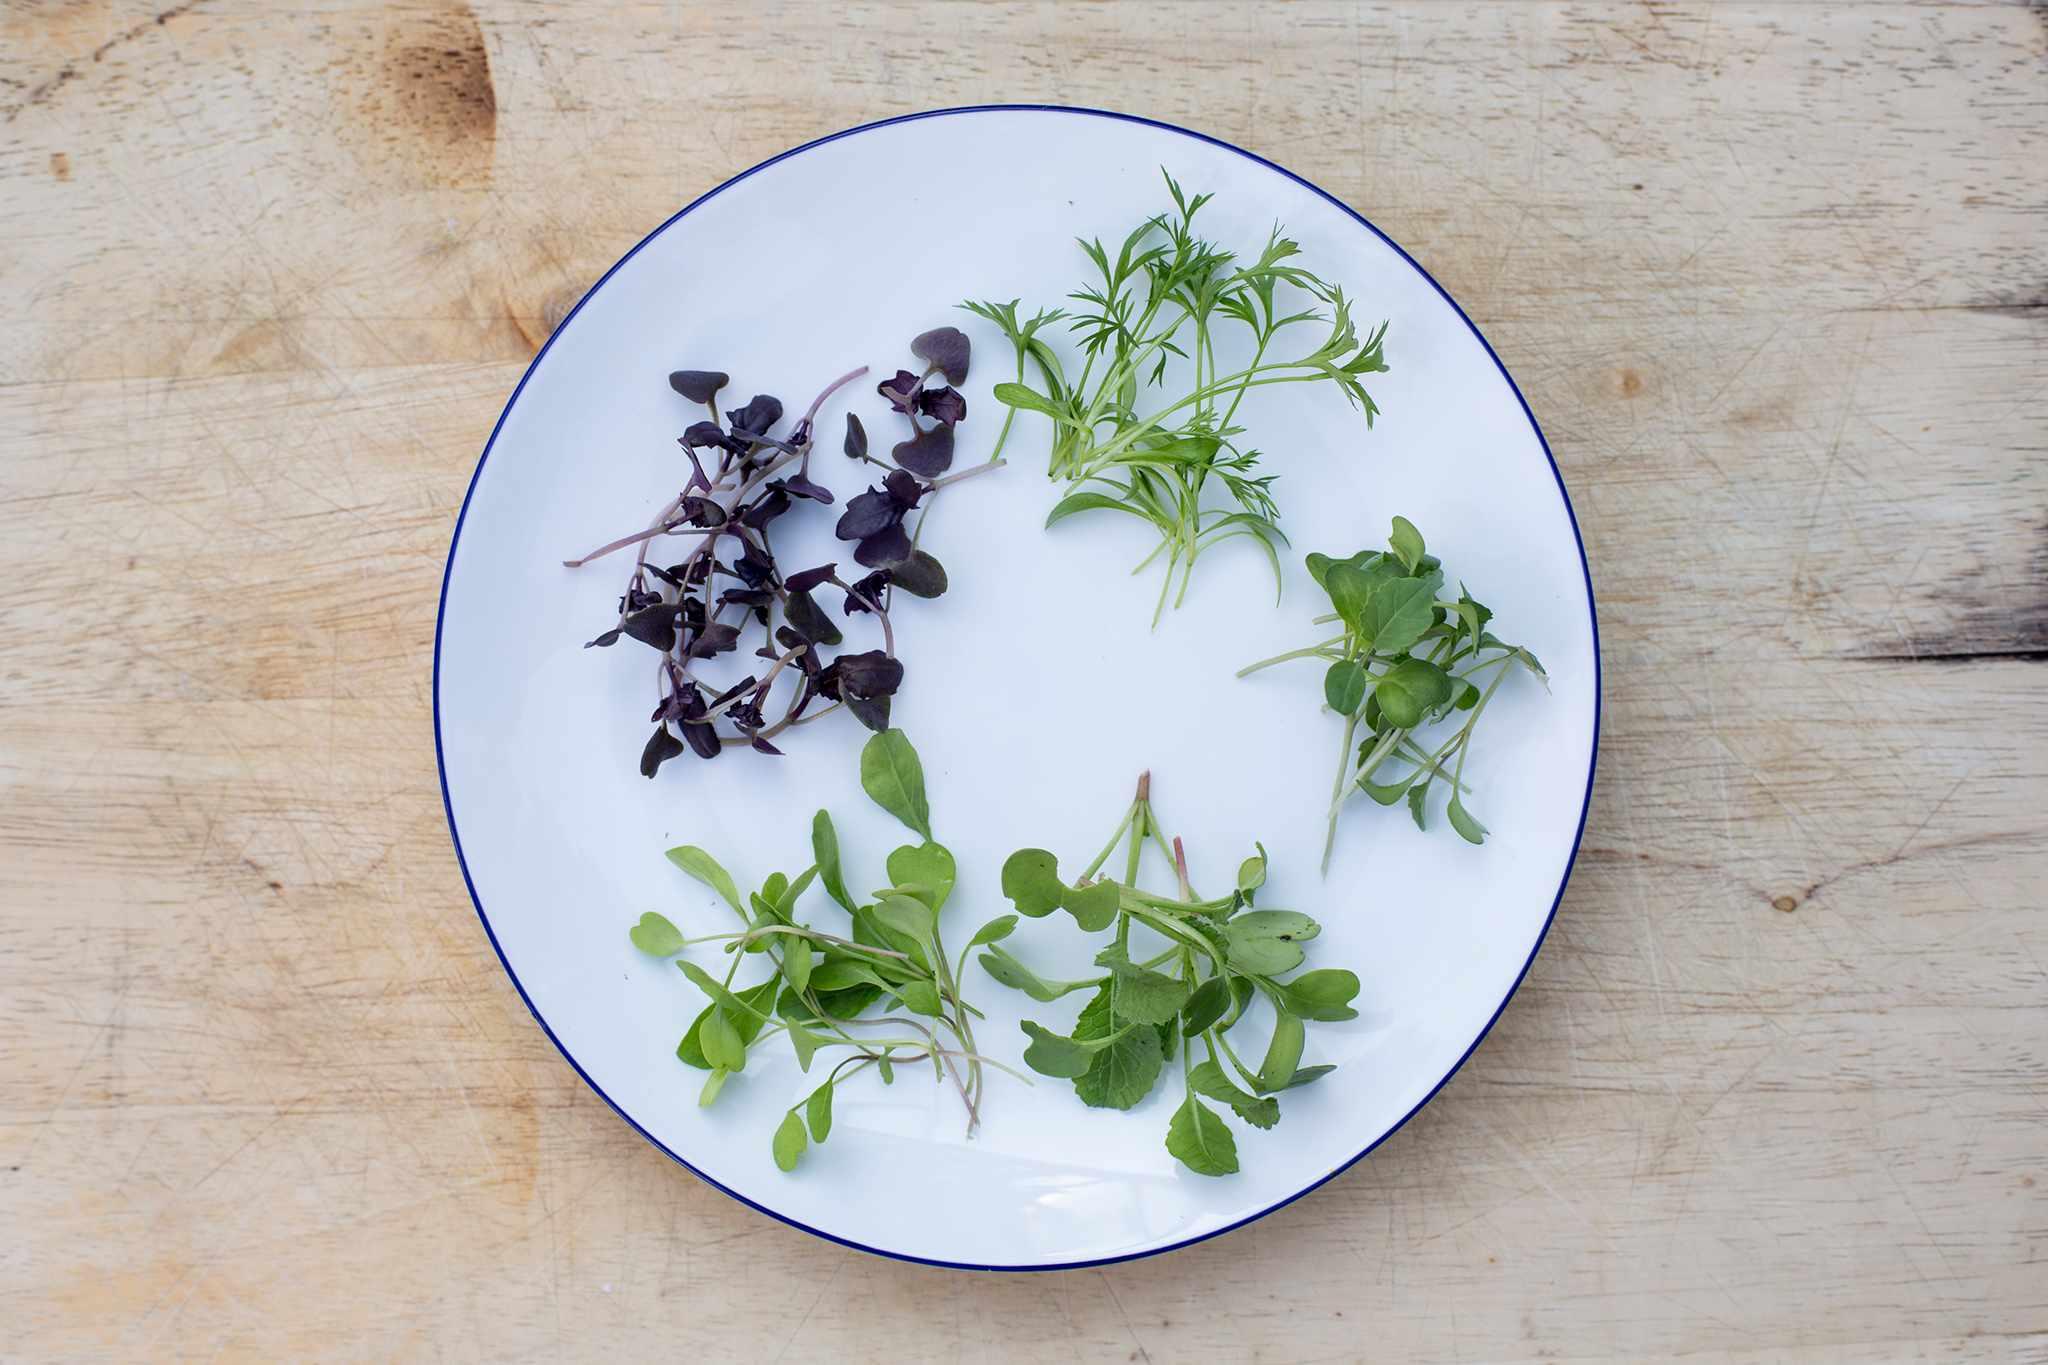 A selection of microgreens